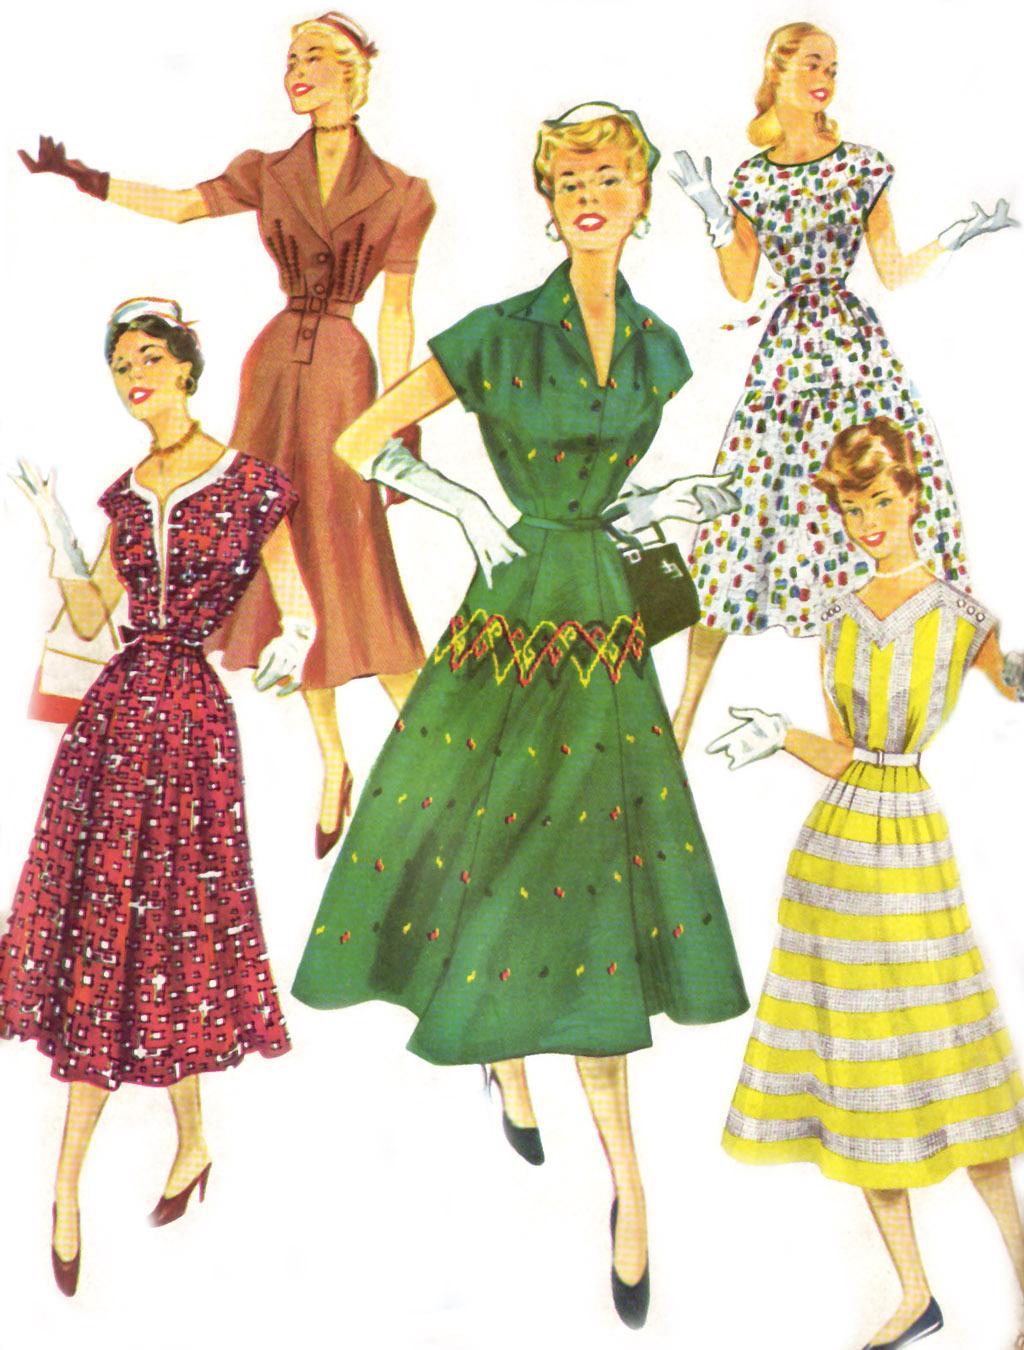 1950s-Fashion-10.jpg